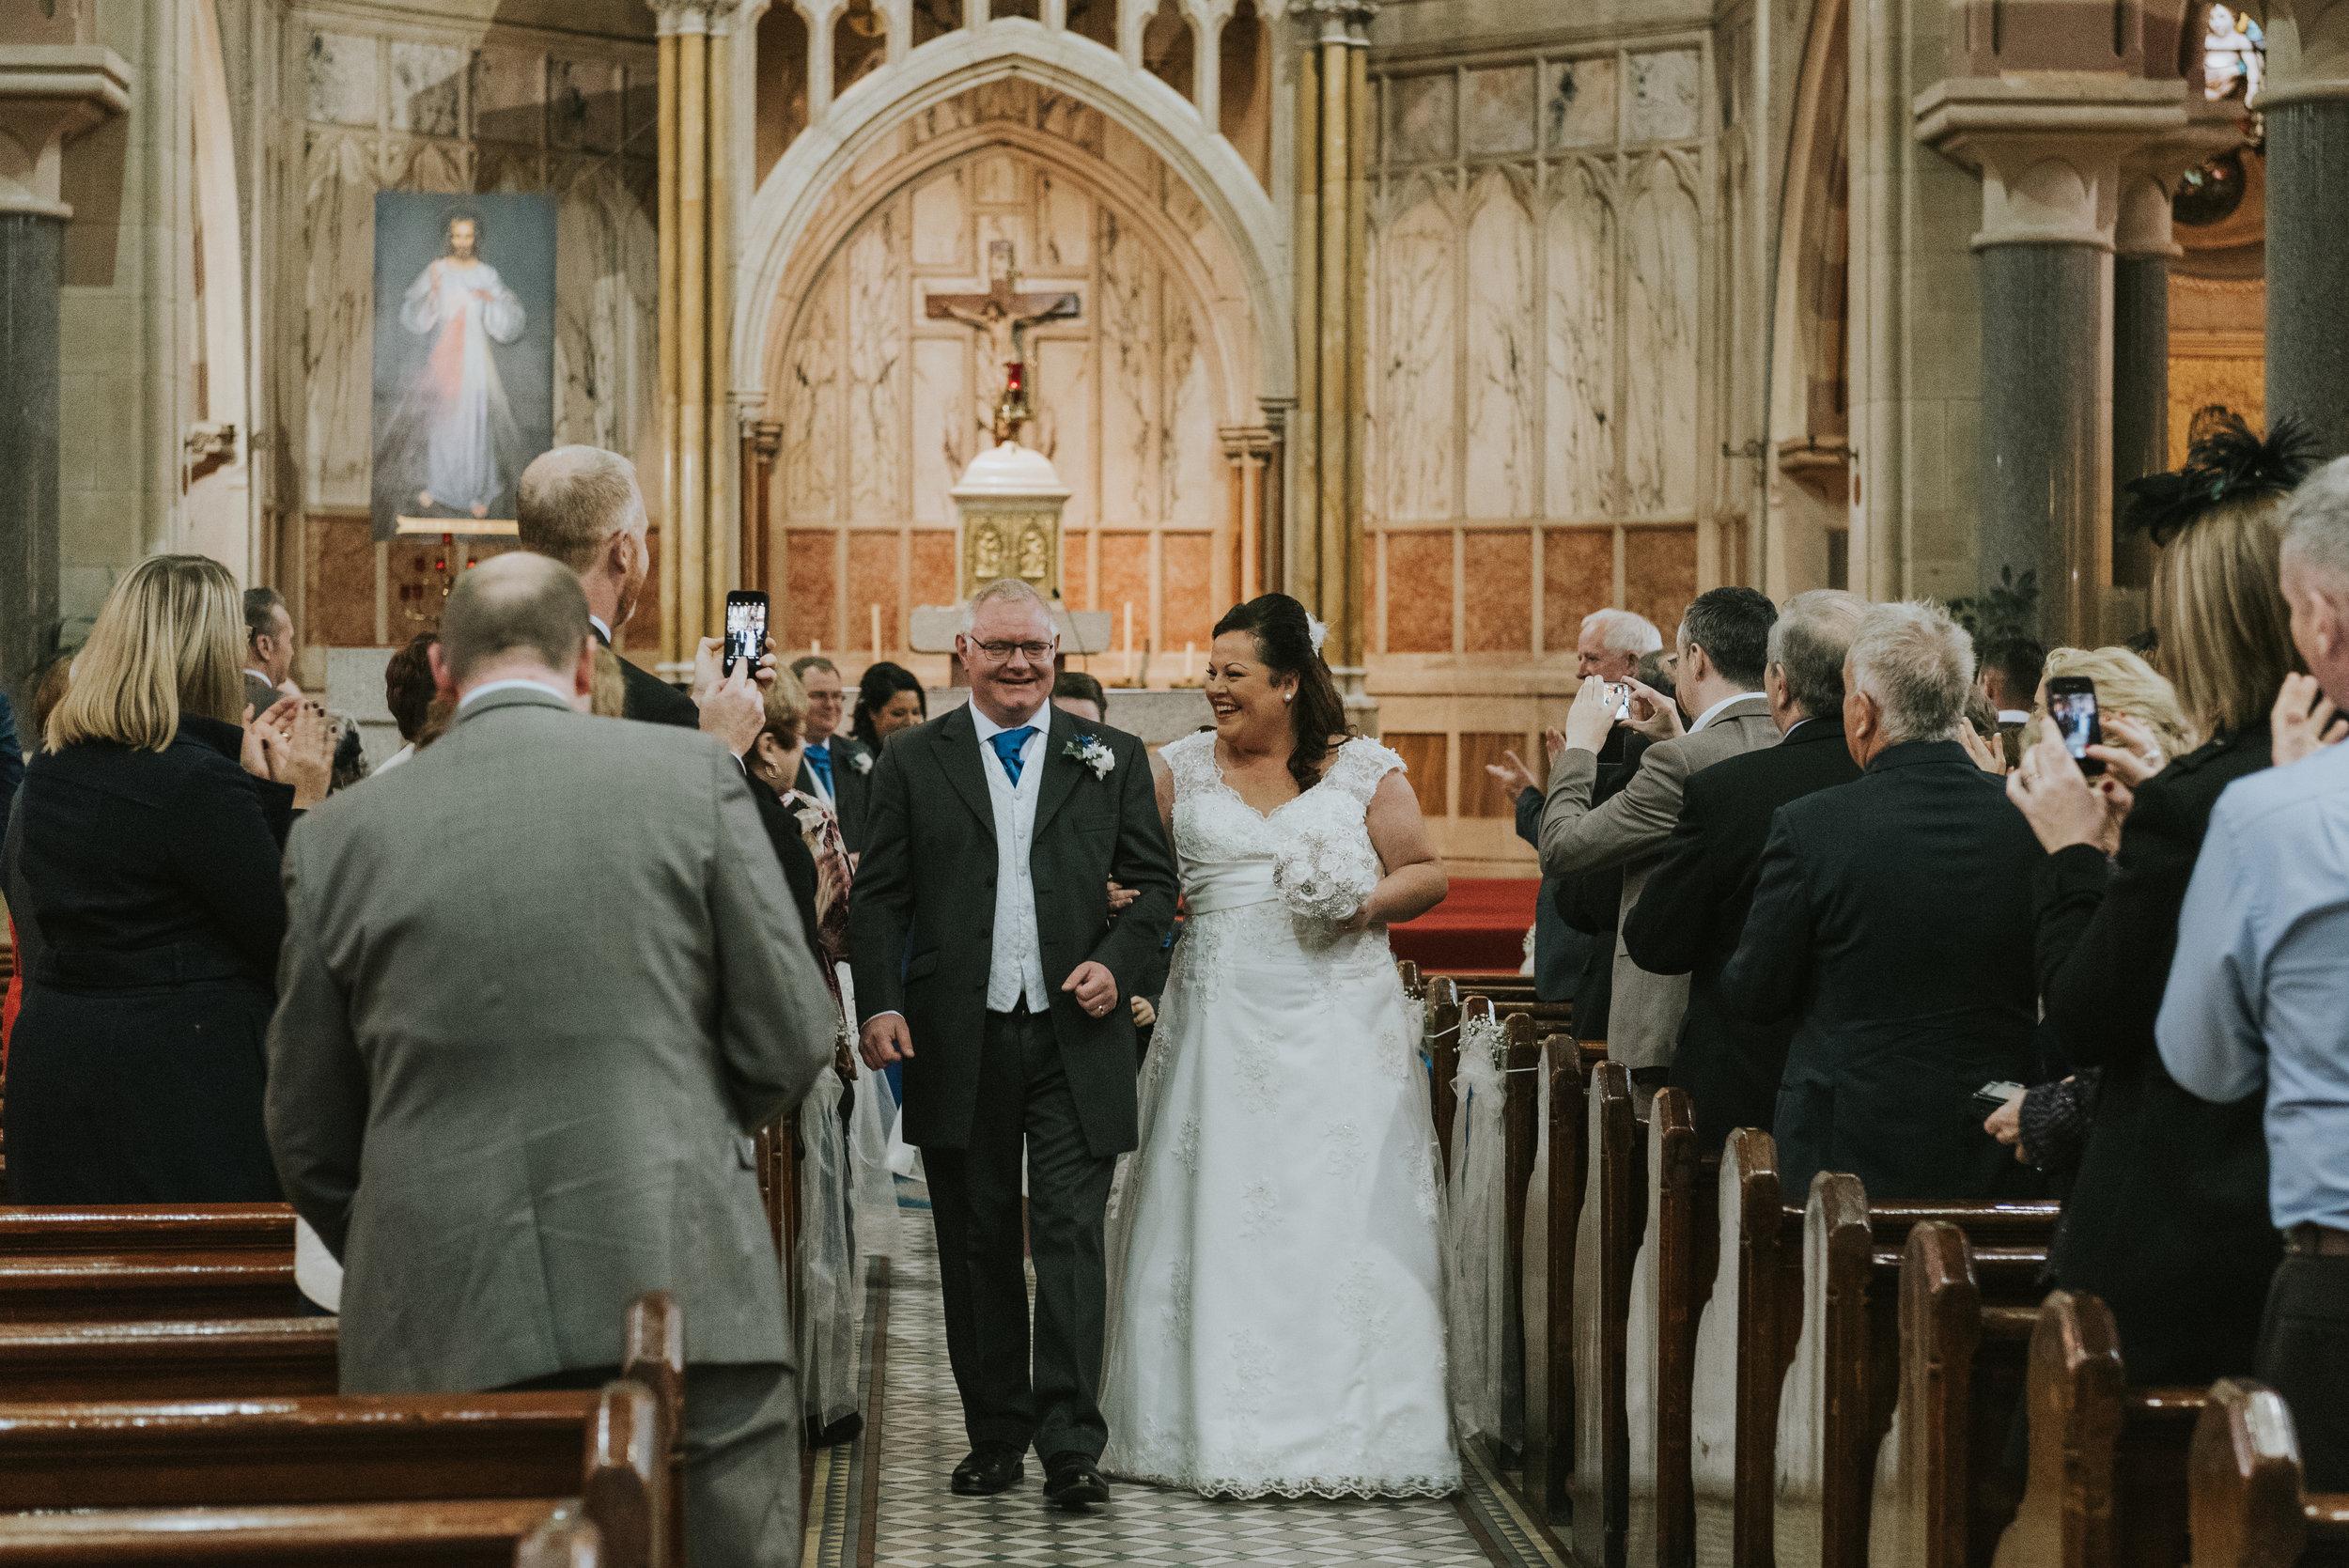 St. Pauls belfast wedding photographer pure photo n.i aisle